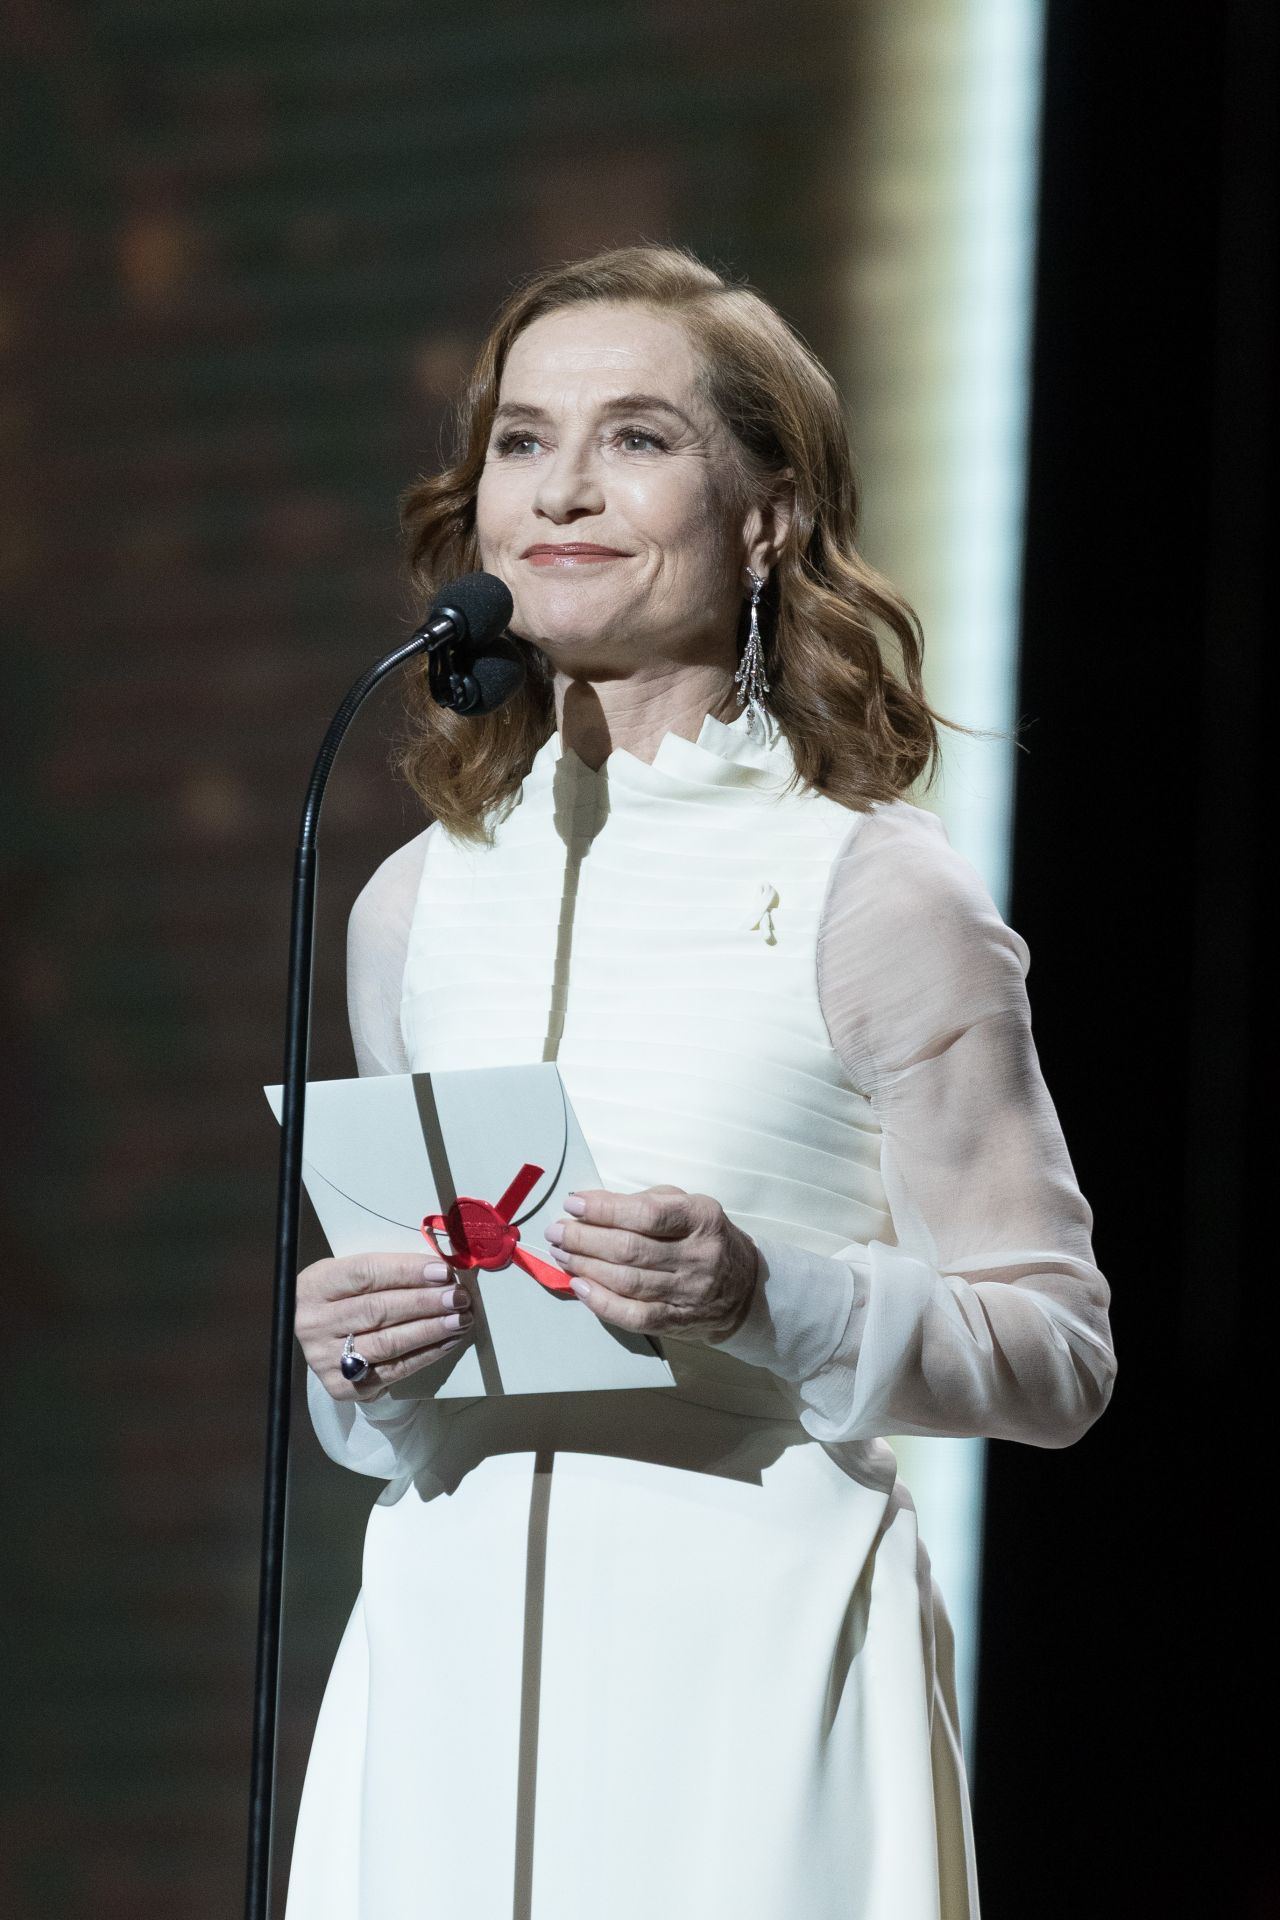 http://celebmafia.com/wp-content/uploads/2018/03/isabelle-huppert-cesar-film-awards-2018-in-paris-6.jpg